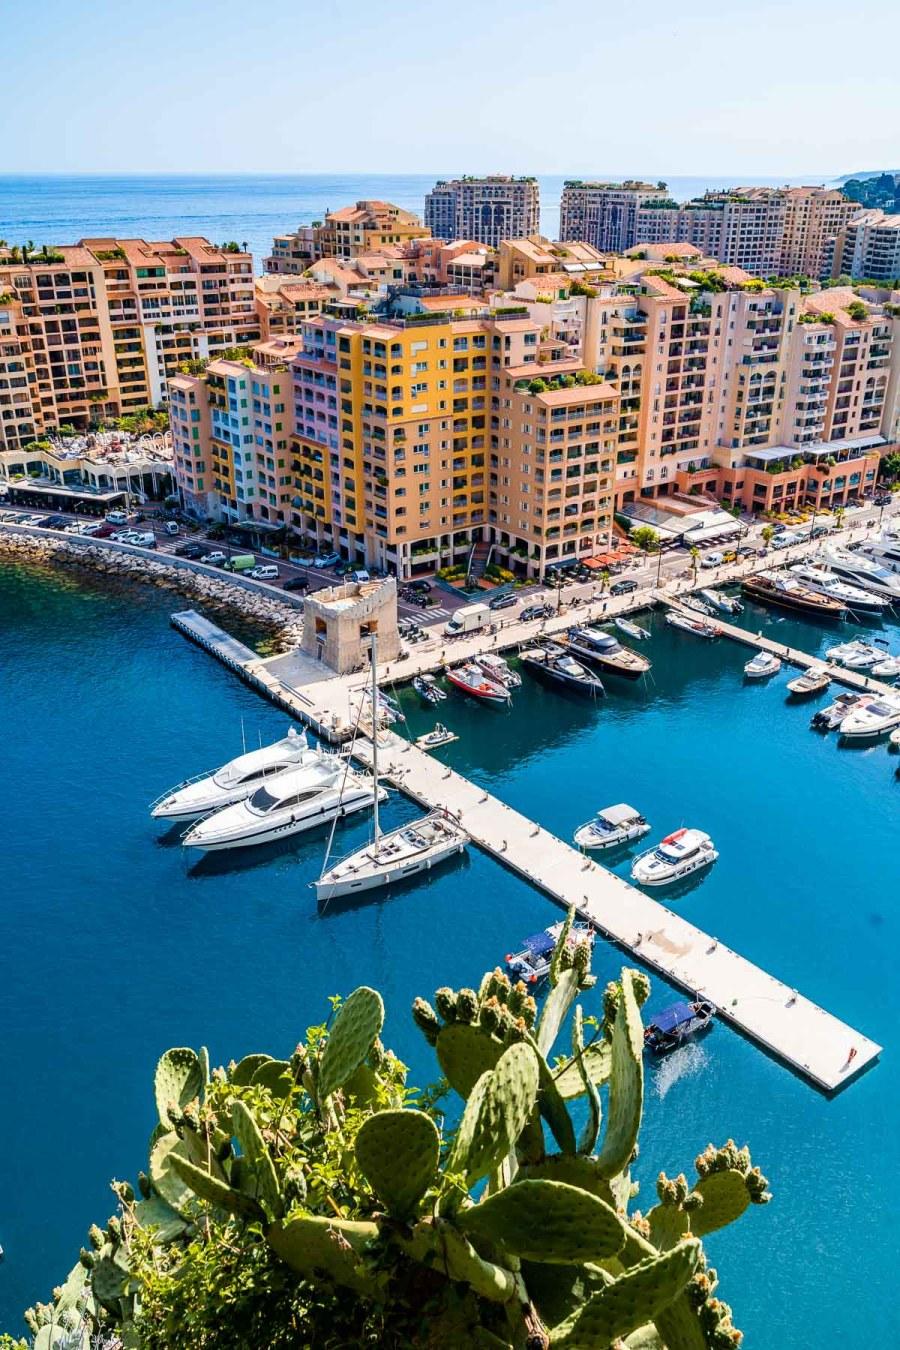 Port de Fontvieille Viewpoint in Monaco